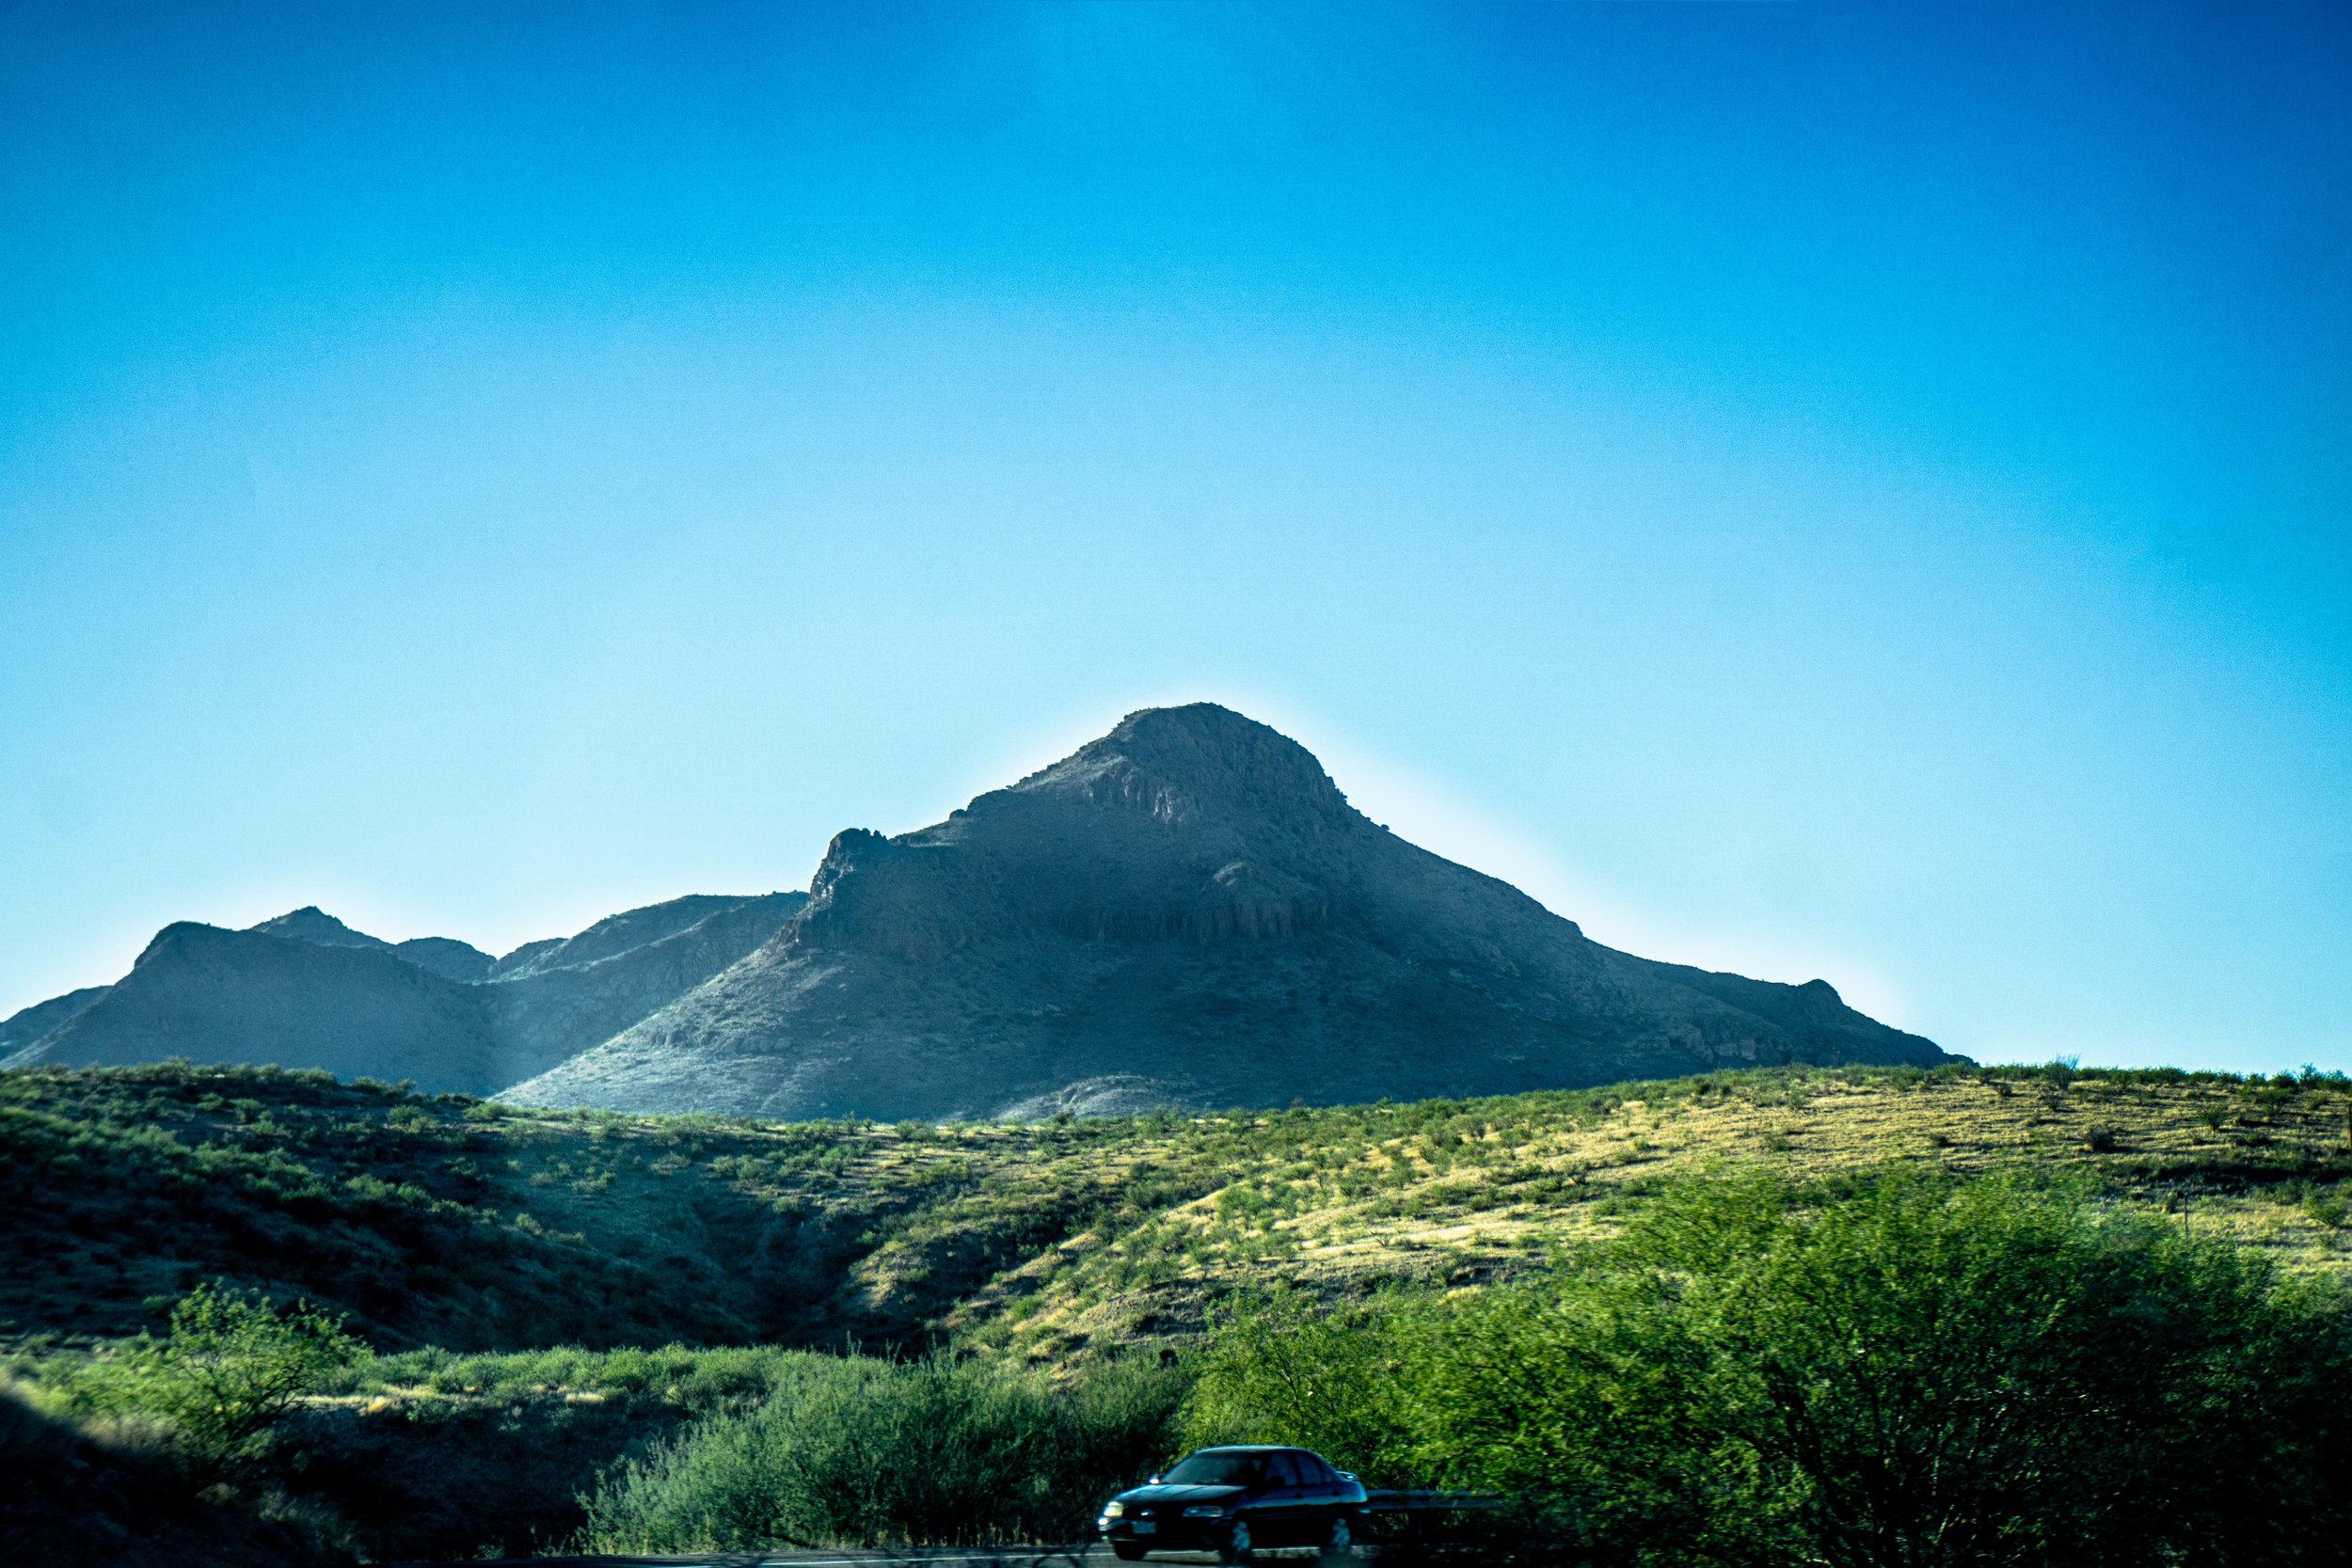 vickygood_photography_nature_mountain.jpg